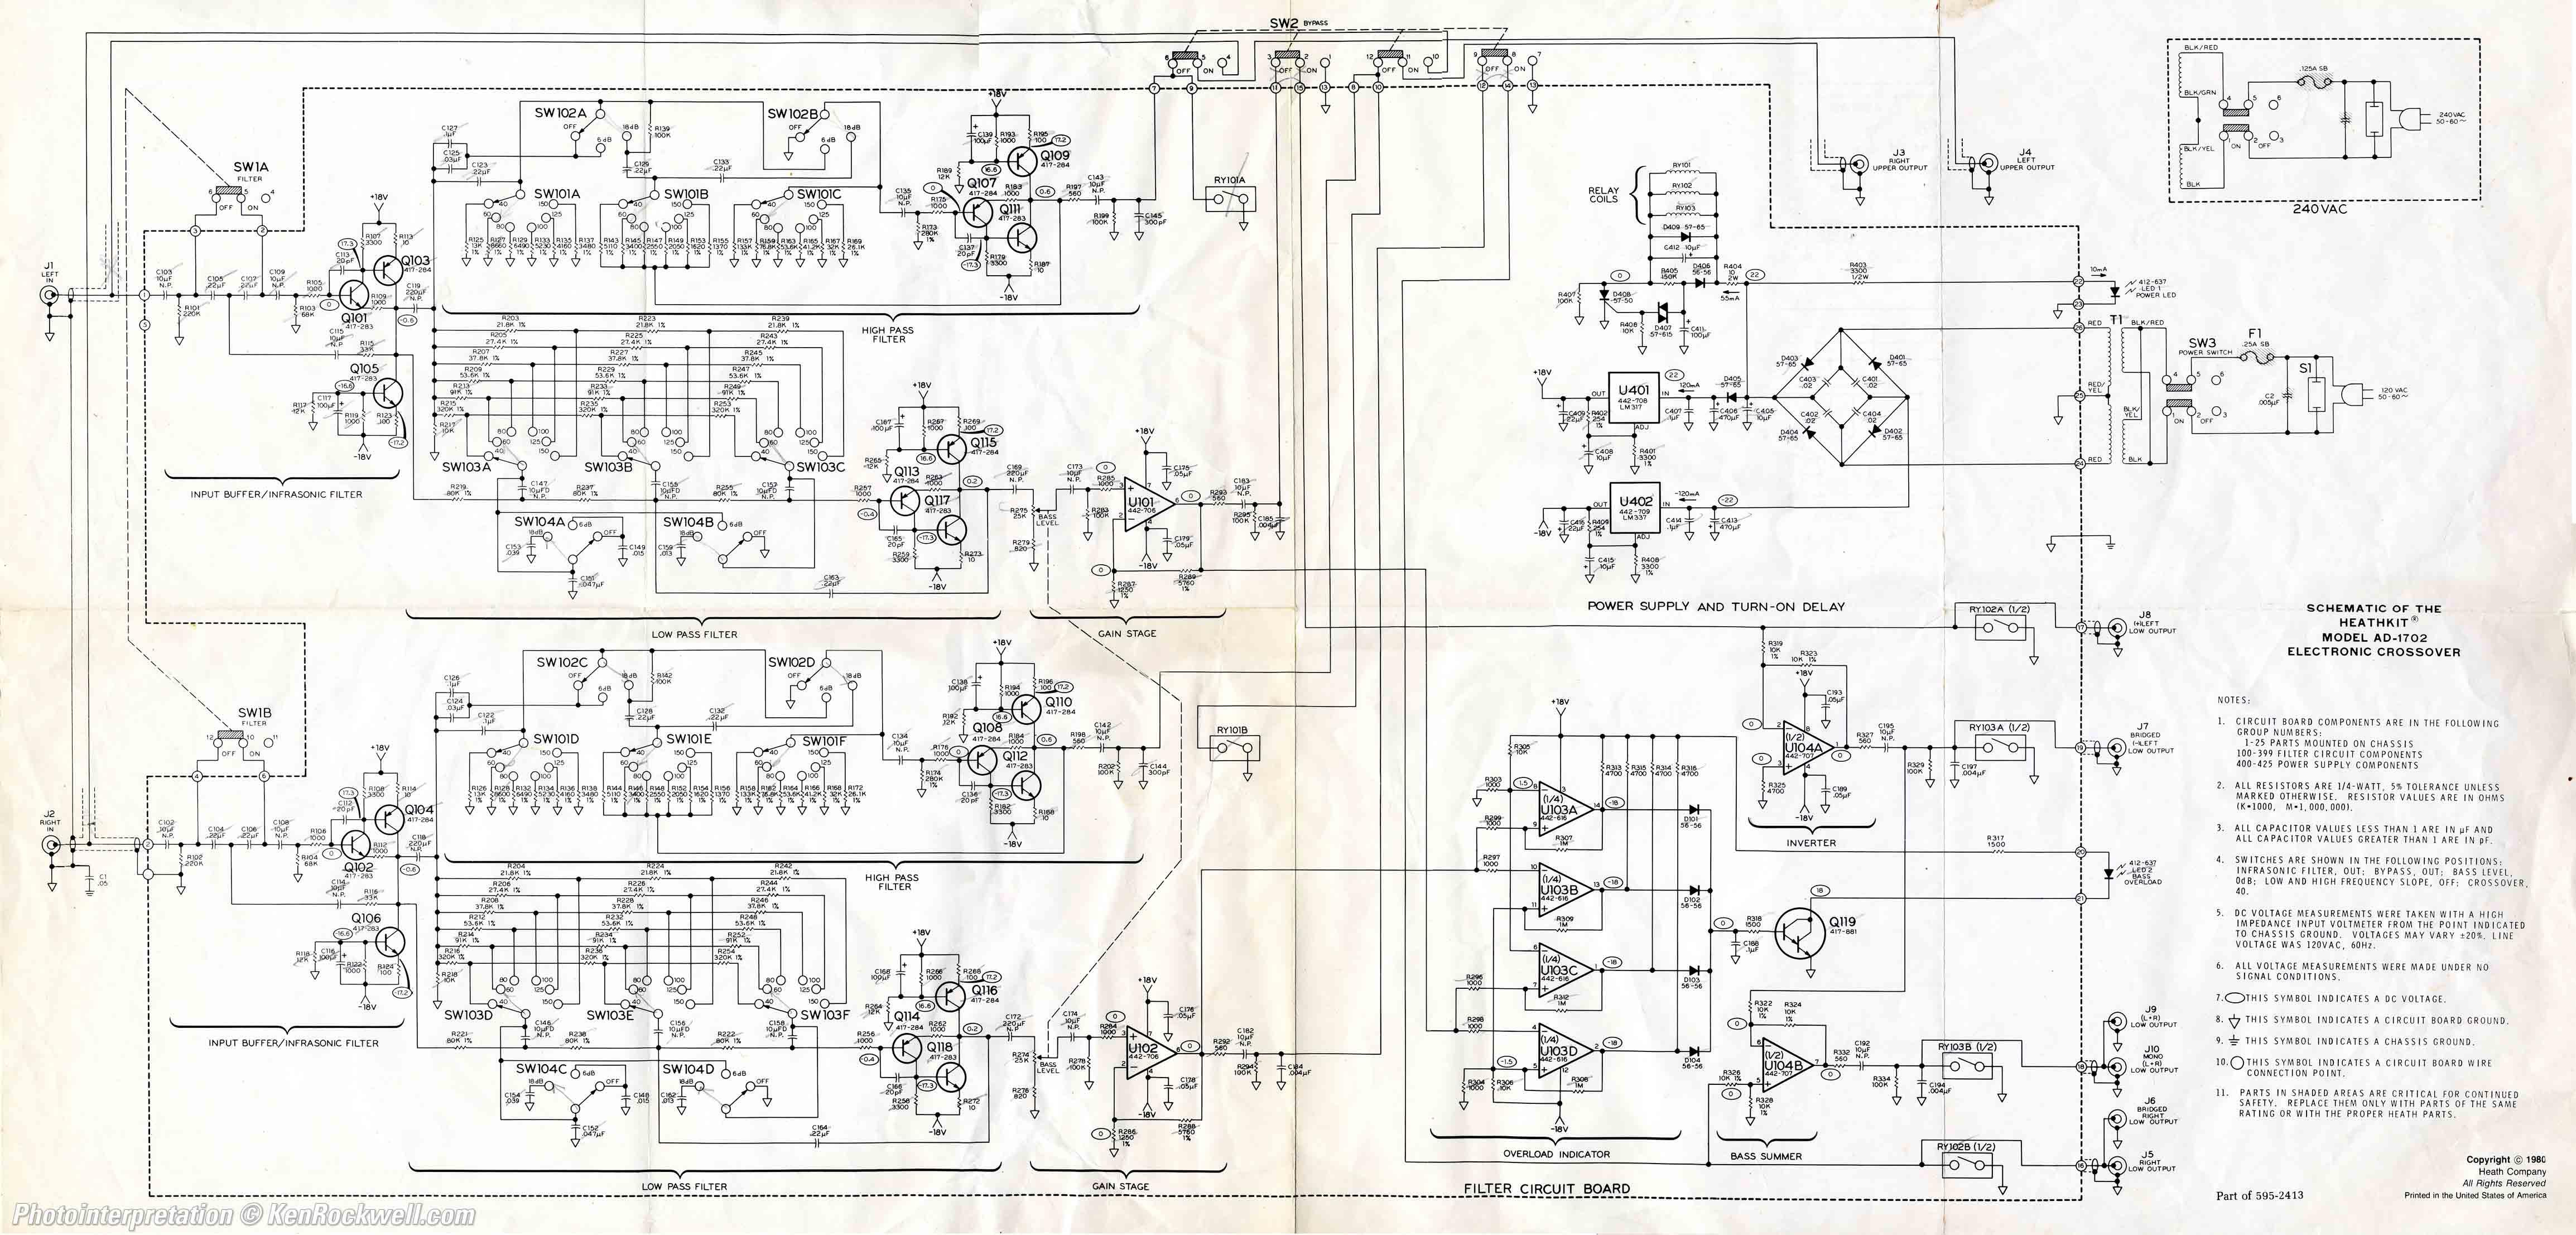 Subwoofer Schematic Diagram